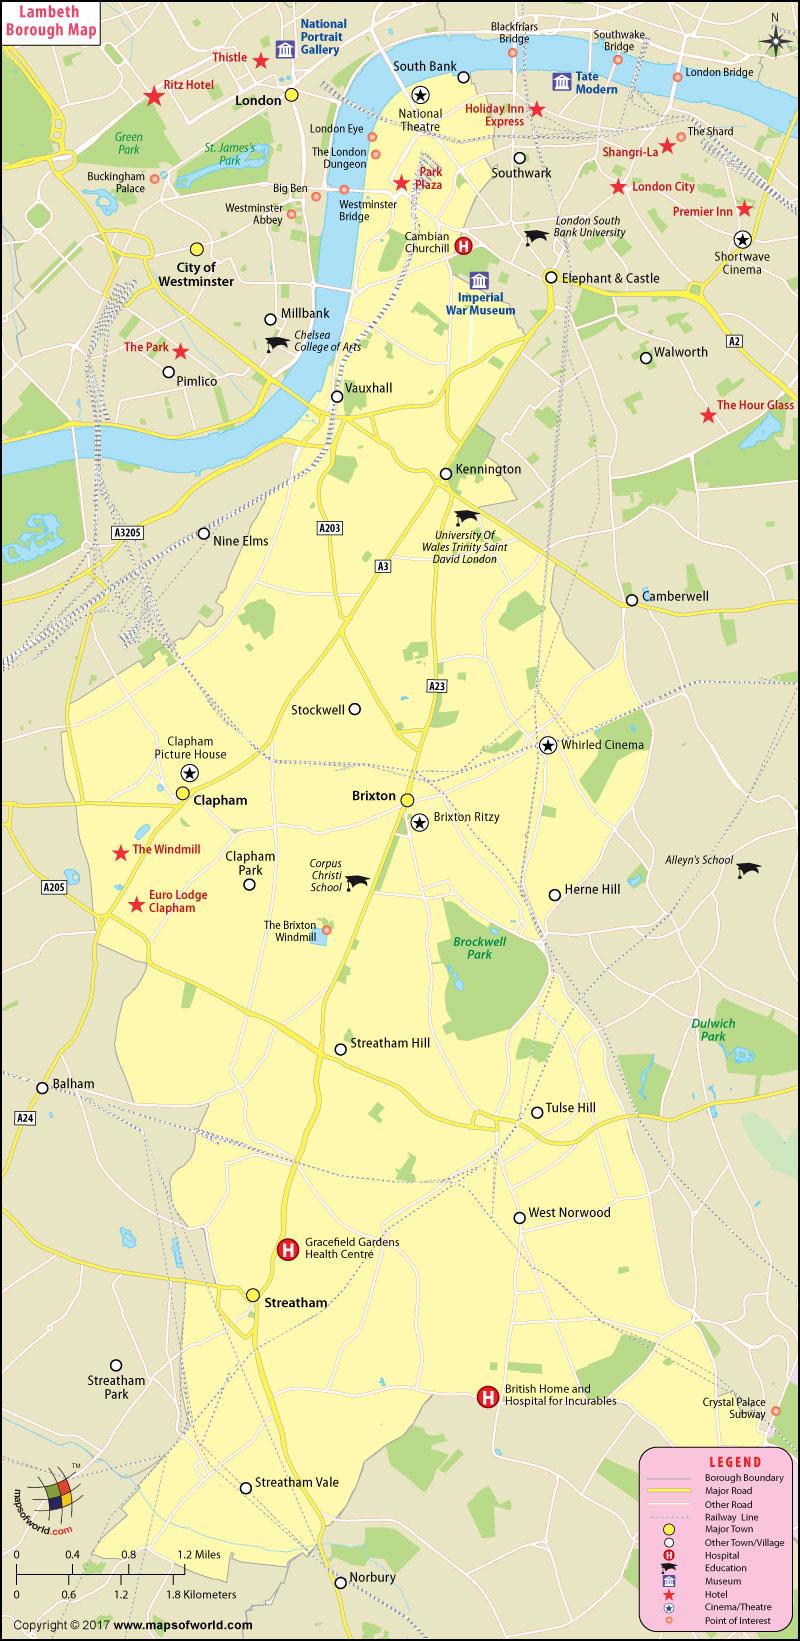 Lambeth Borough Map, London